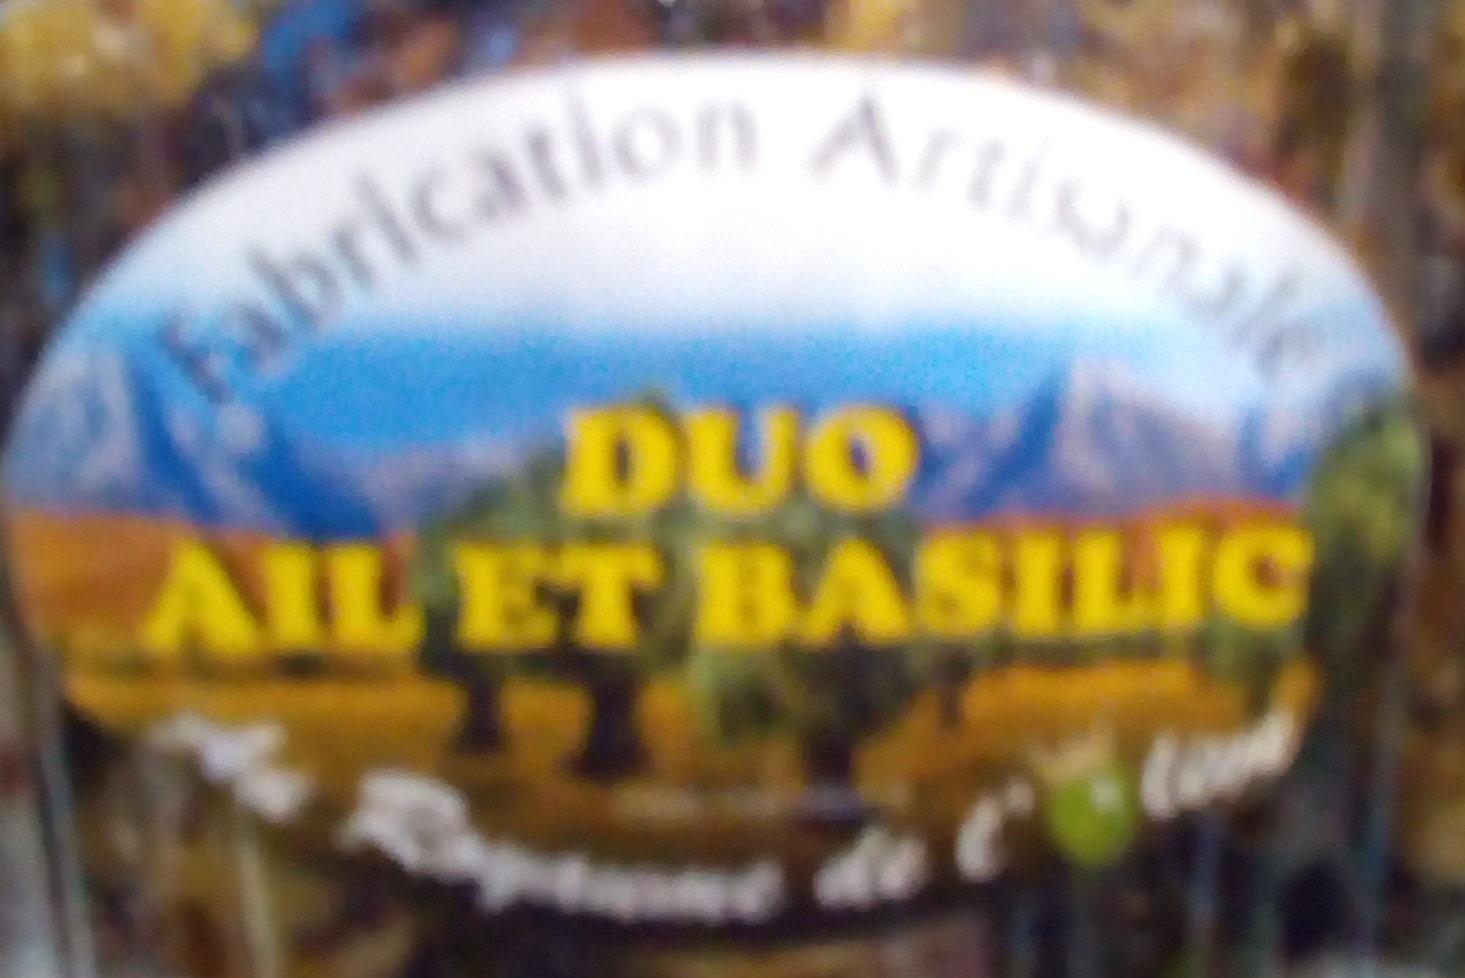 olives duo ail et basilic - Produit - fr